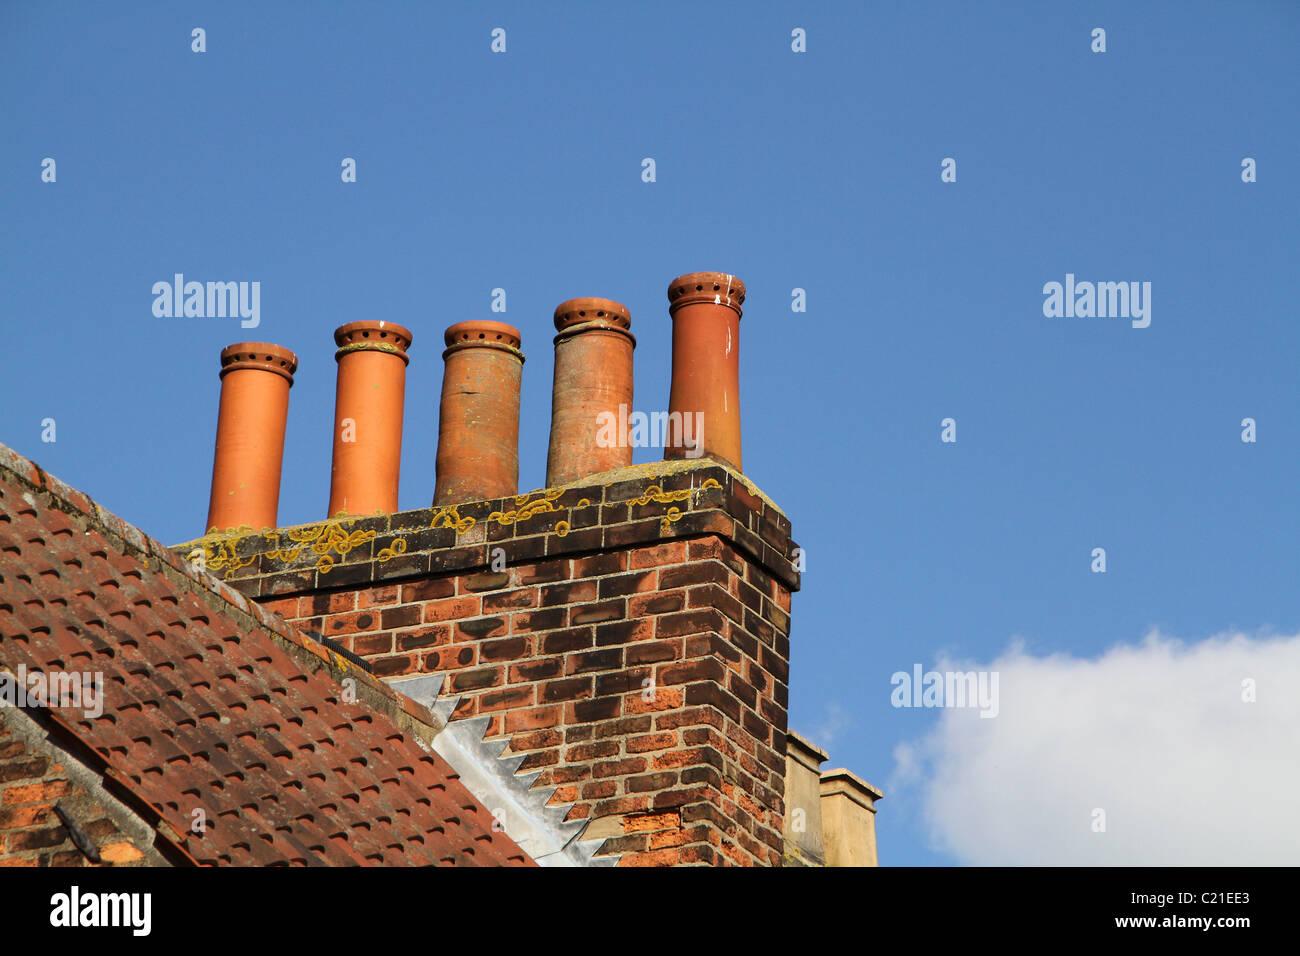 Terracotta chimney pots. - Stock Image